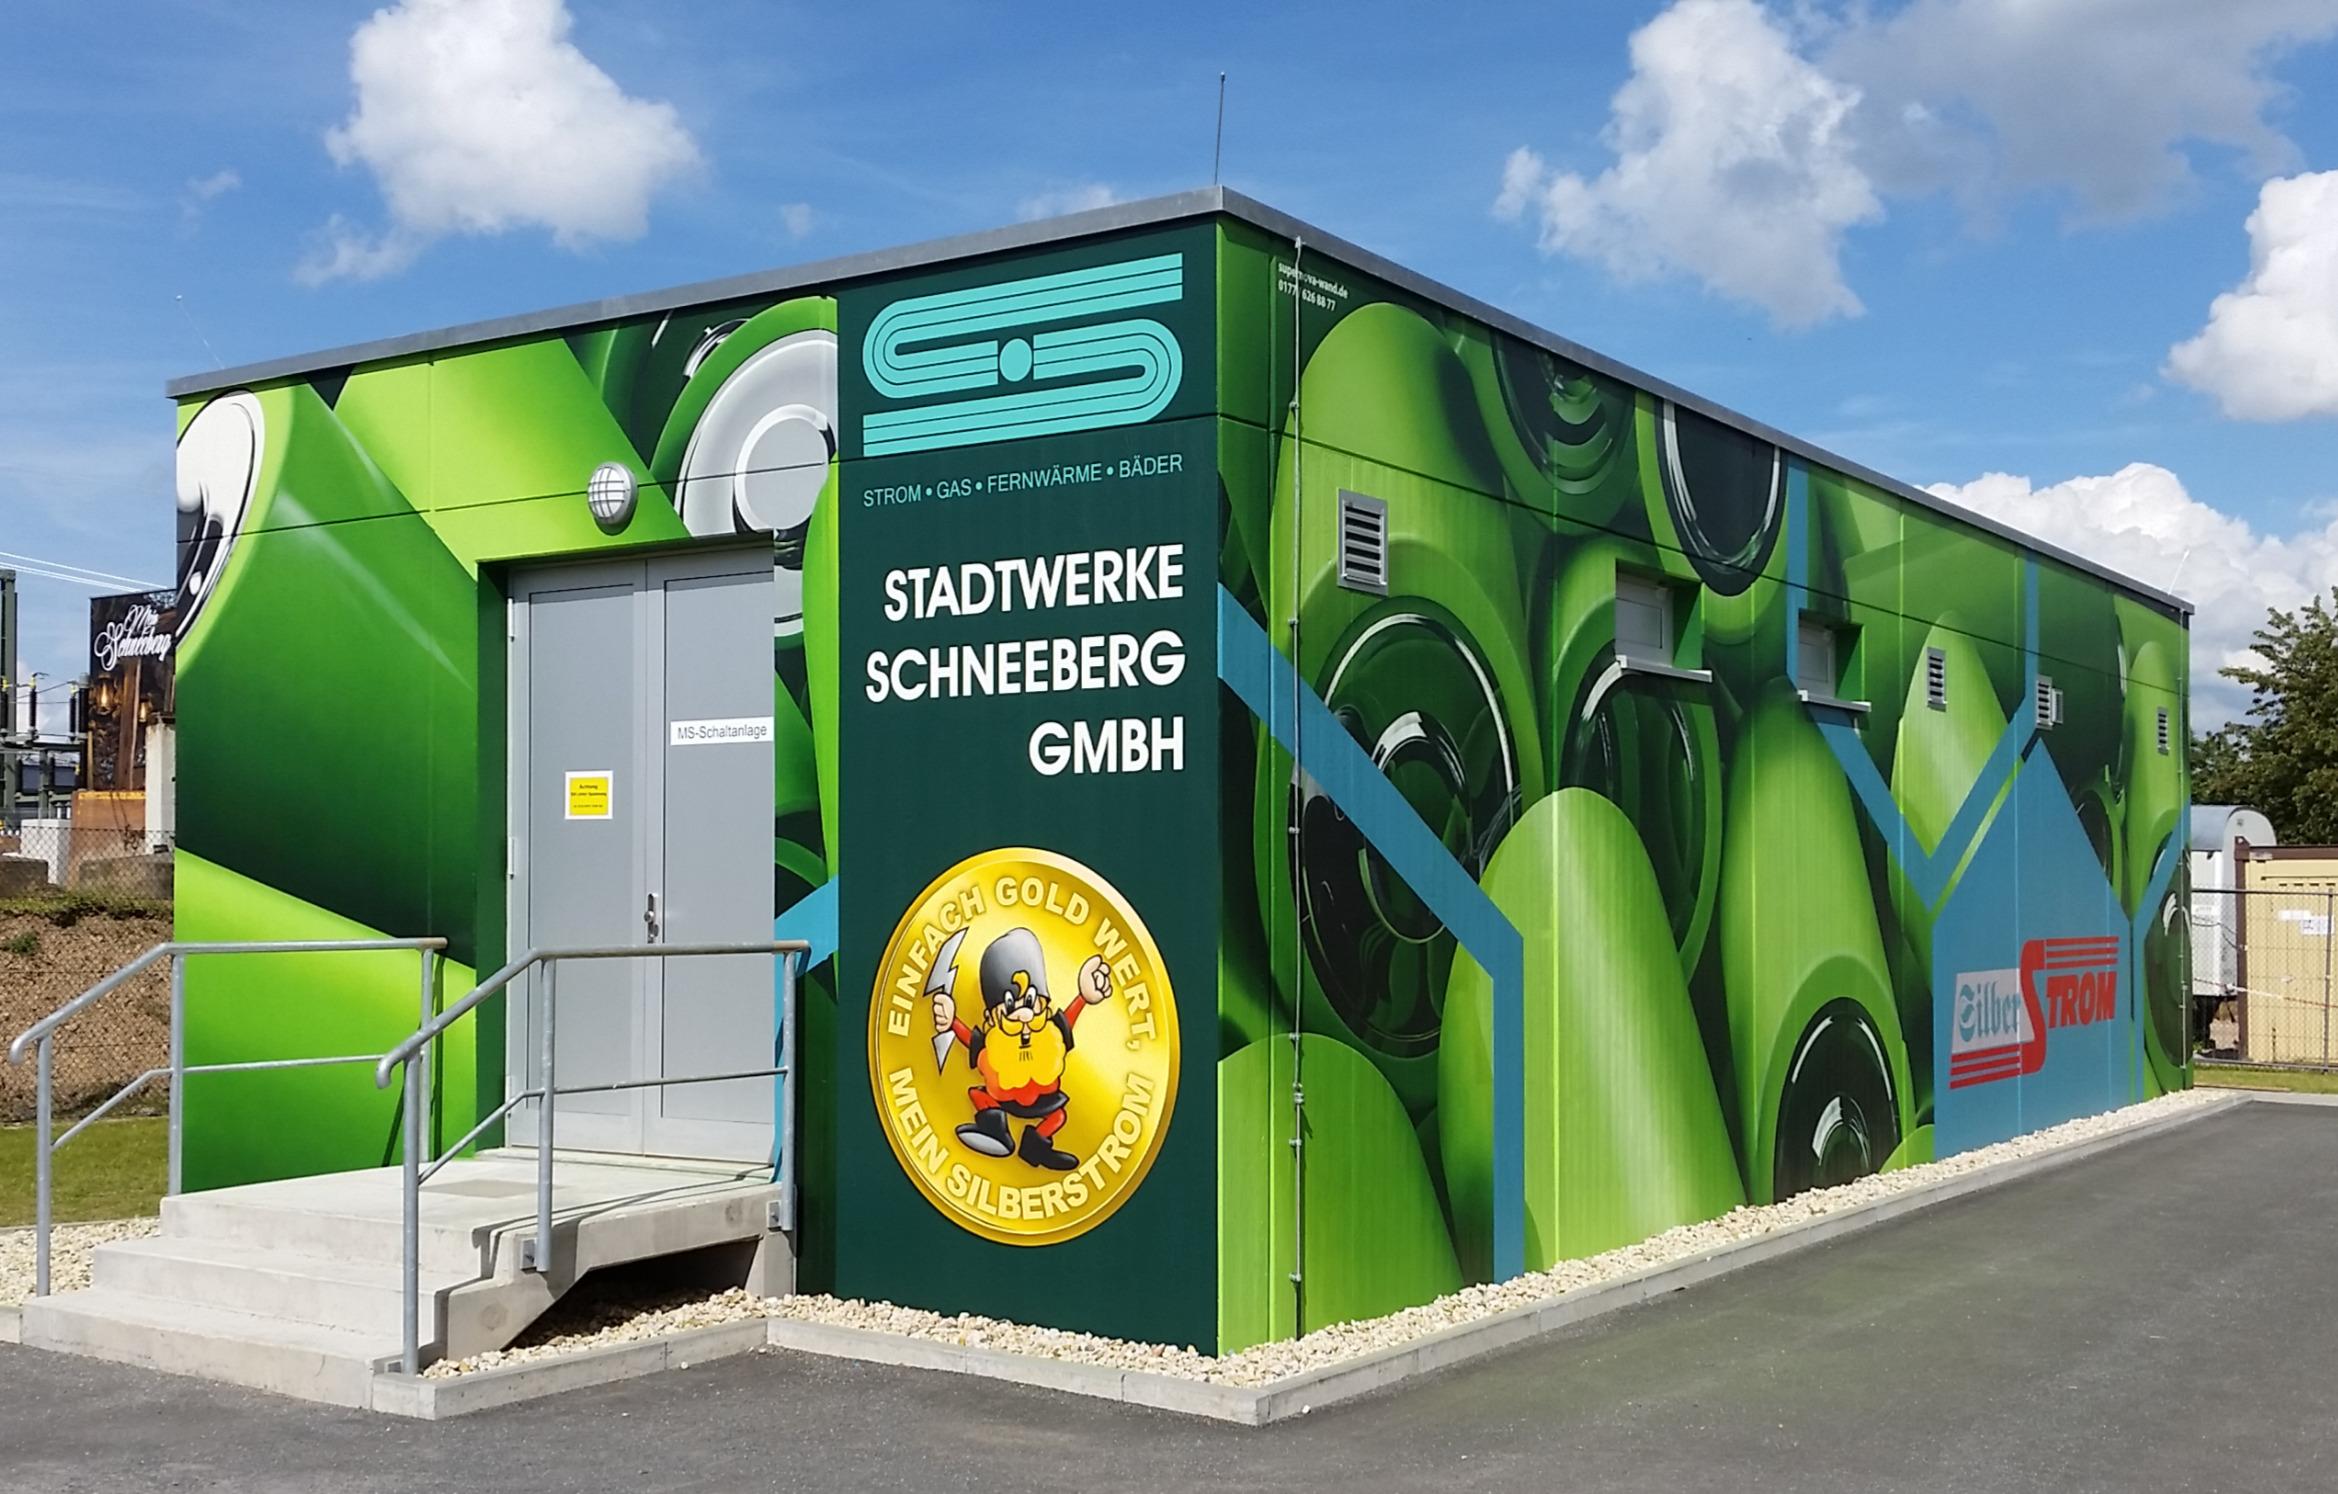 Umspannwerk Stadtwerke Schneeberg